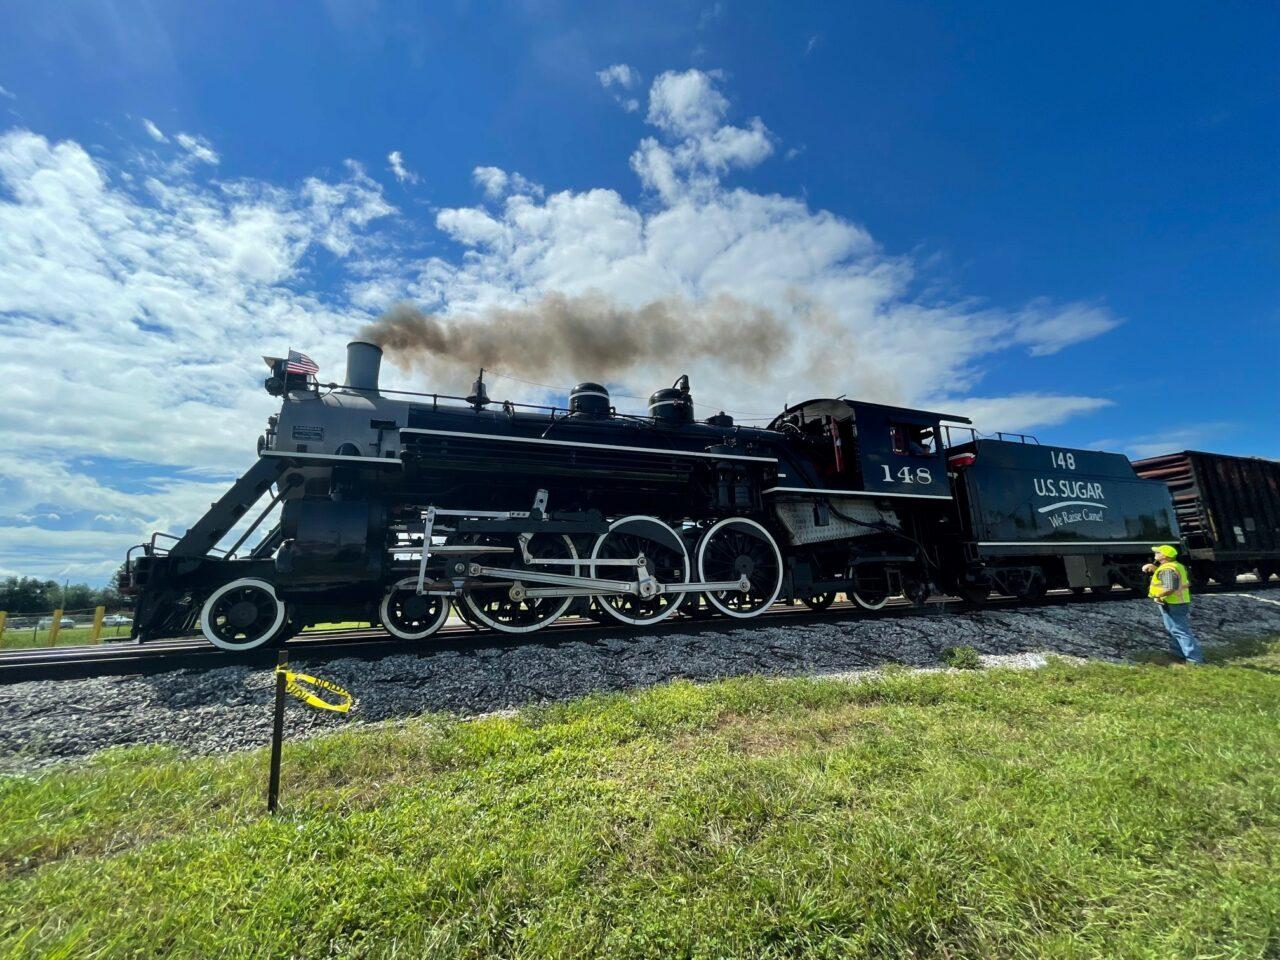 U.S. Sugar locomotive No. 148